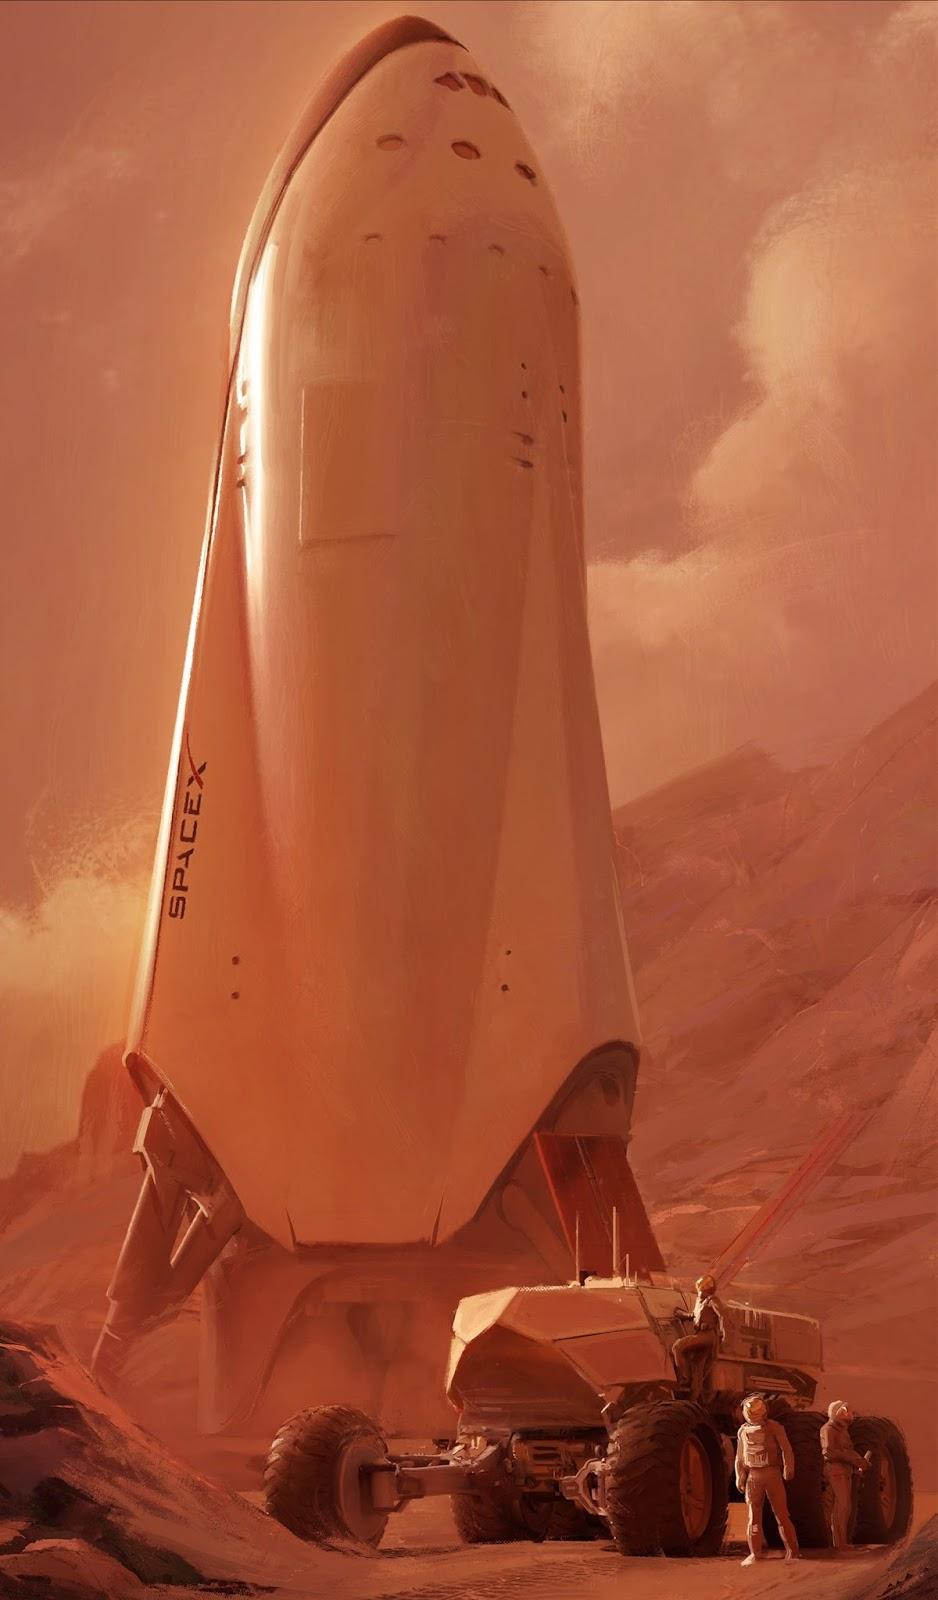 spacex mars base - photo #10